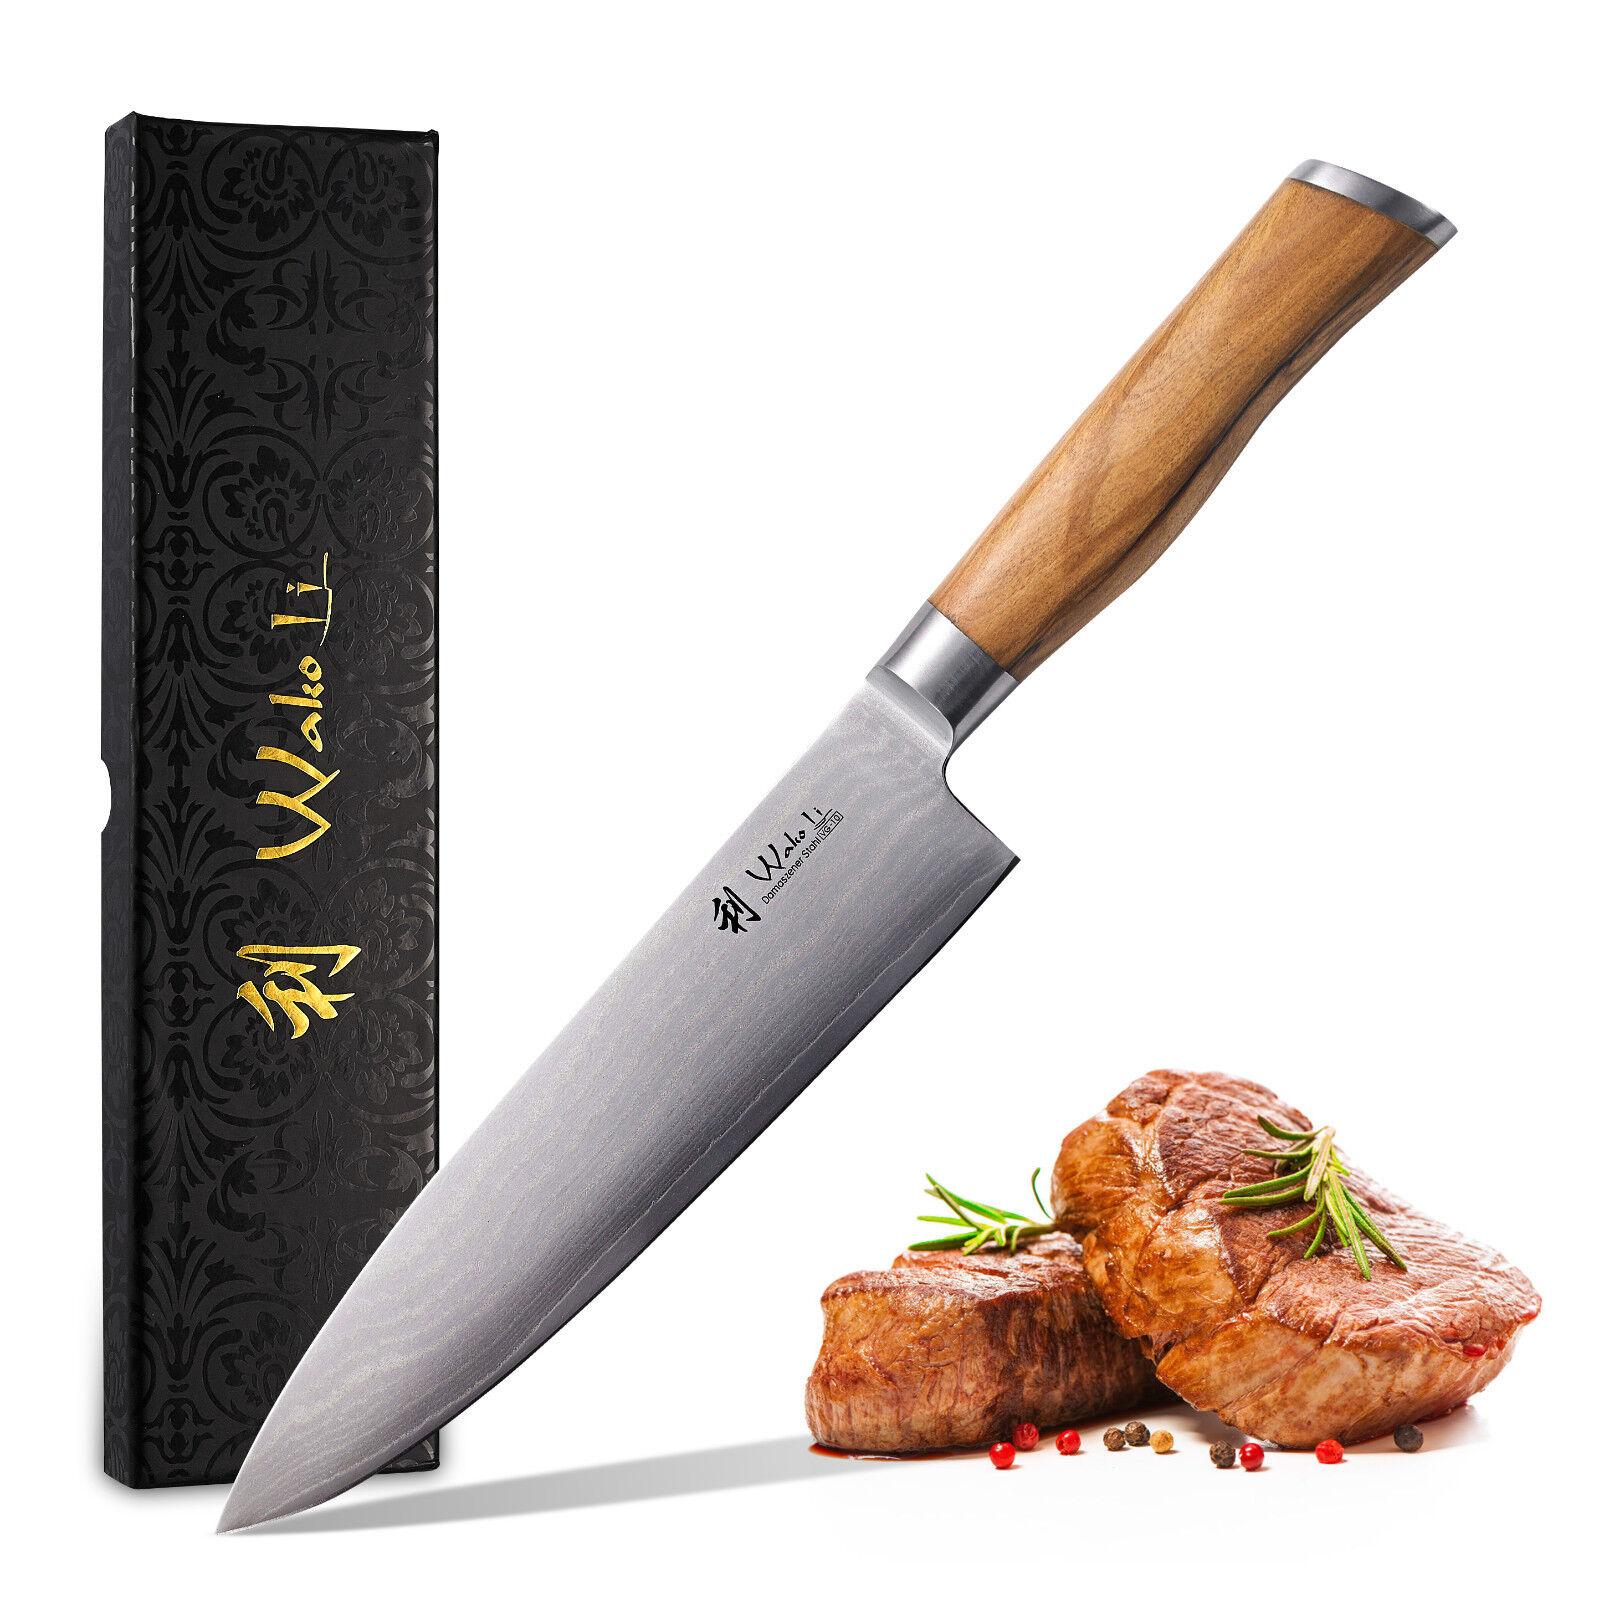 Wakoli olives damassé couteau de cuisine damassé couteau, WAKOLI olives Chefmesser (Nouveau)